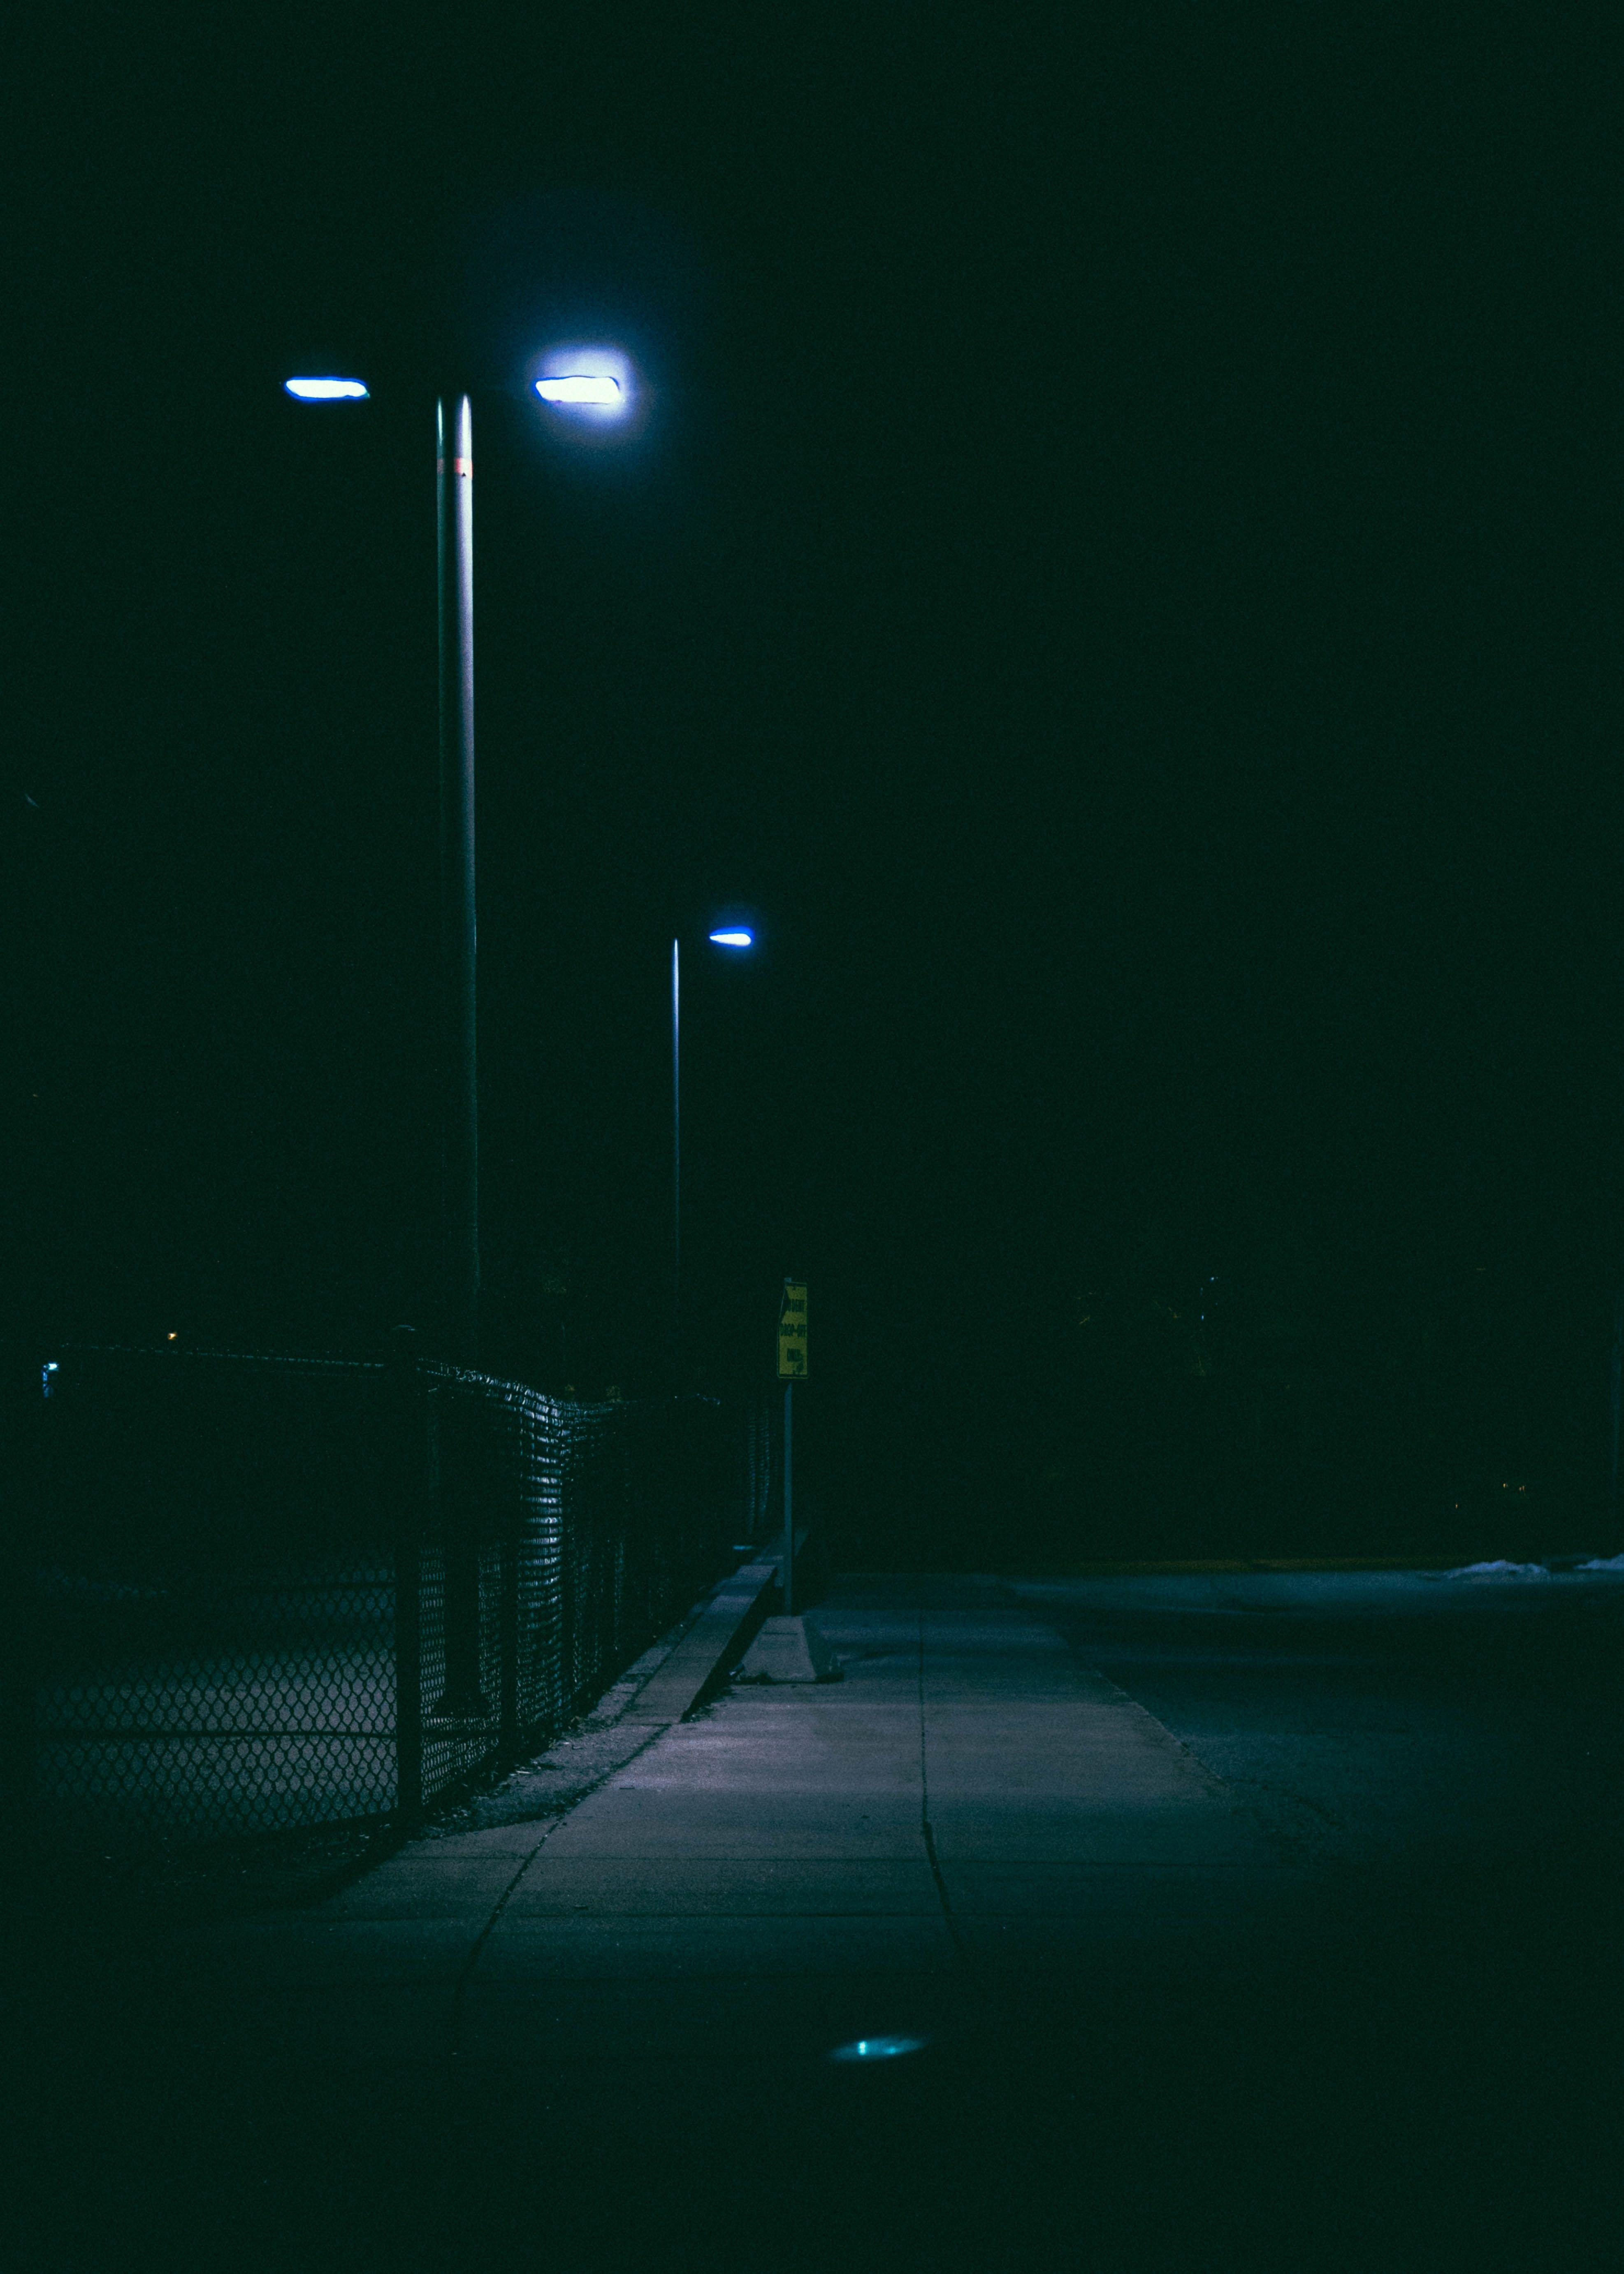 Lighted Street Post At Nighttime Street Light Night Time Night